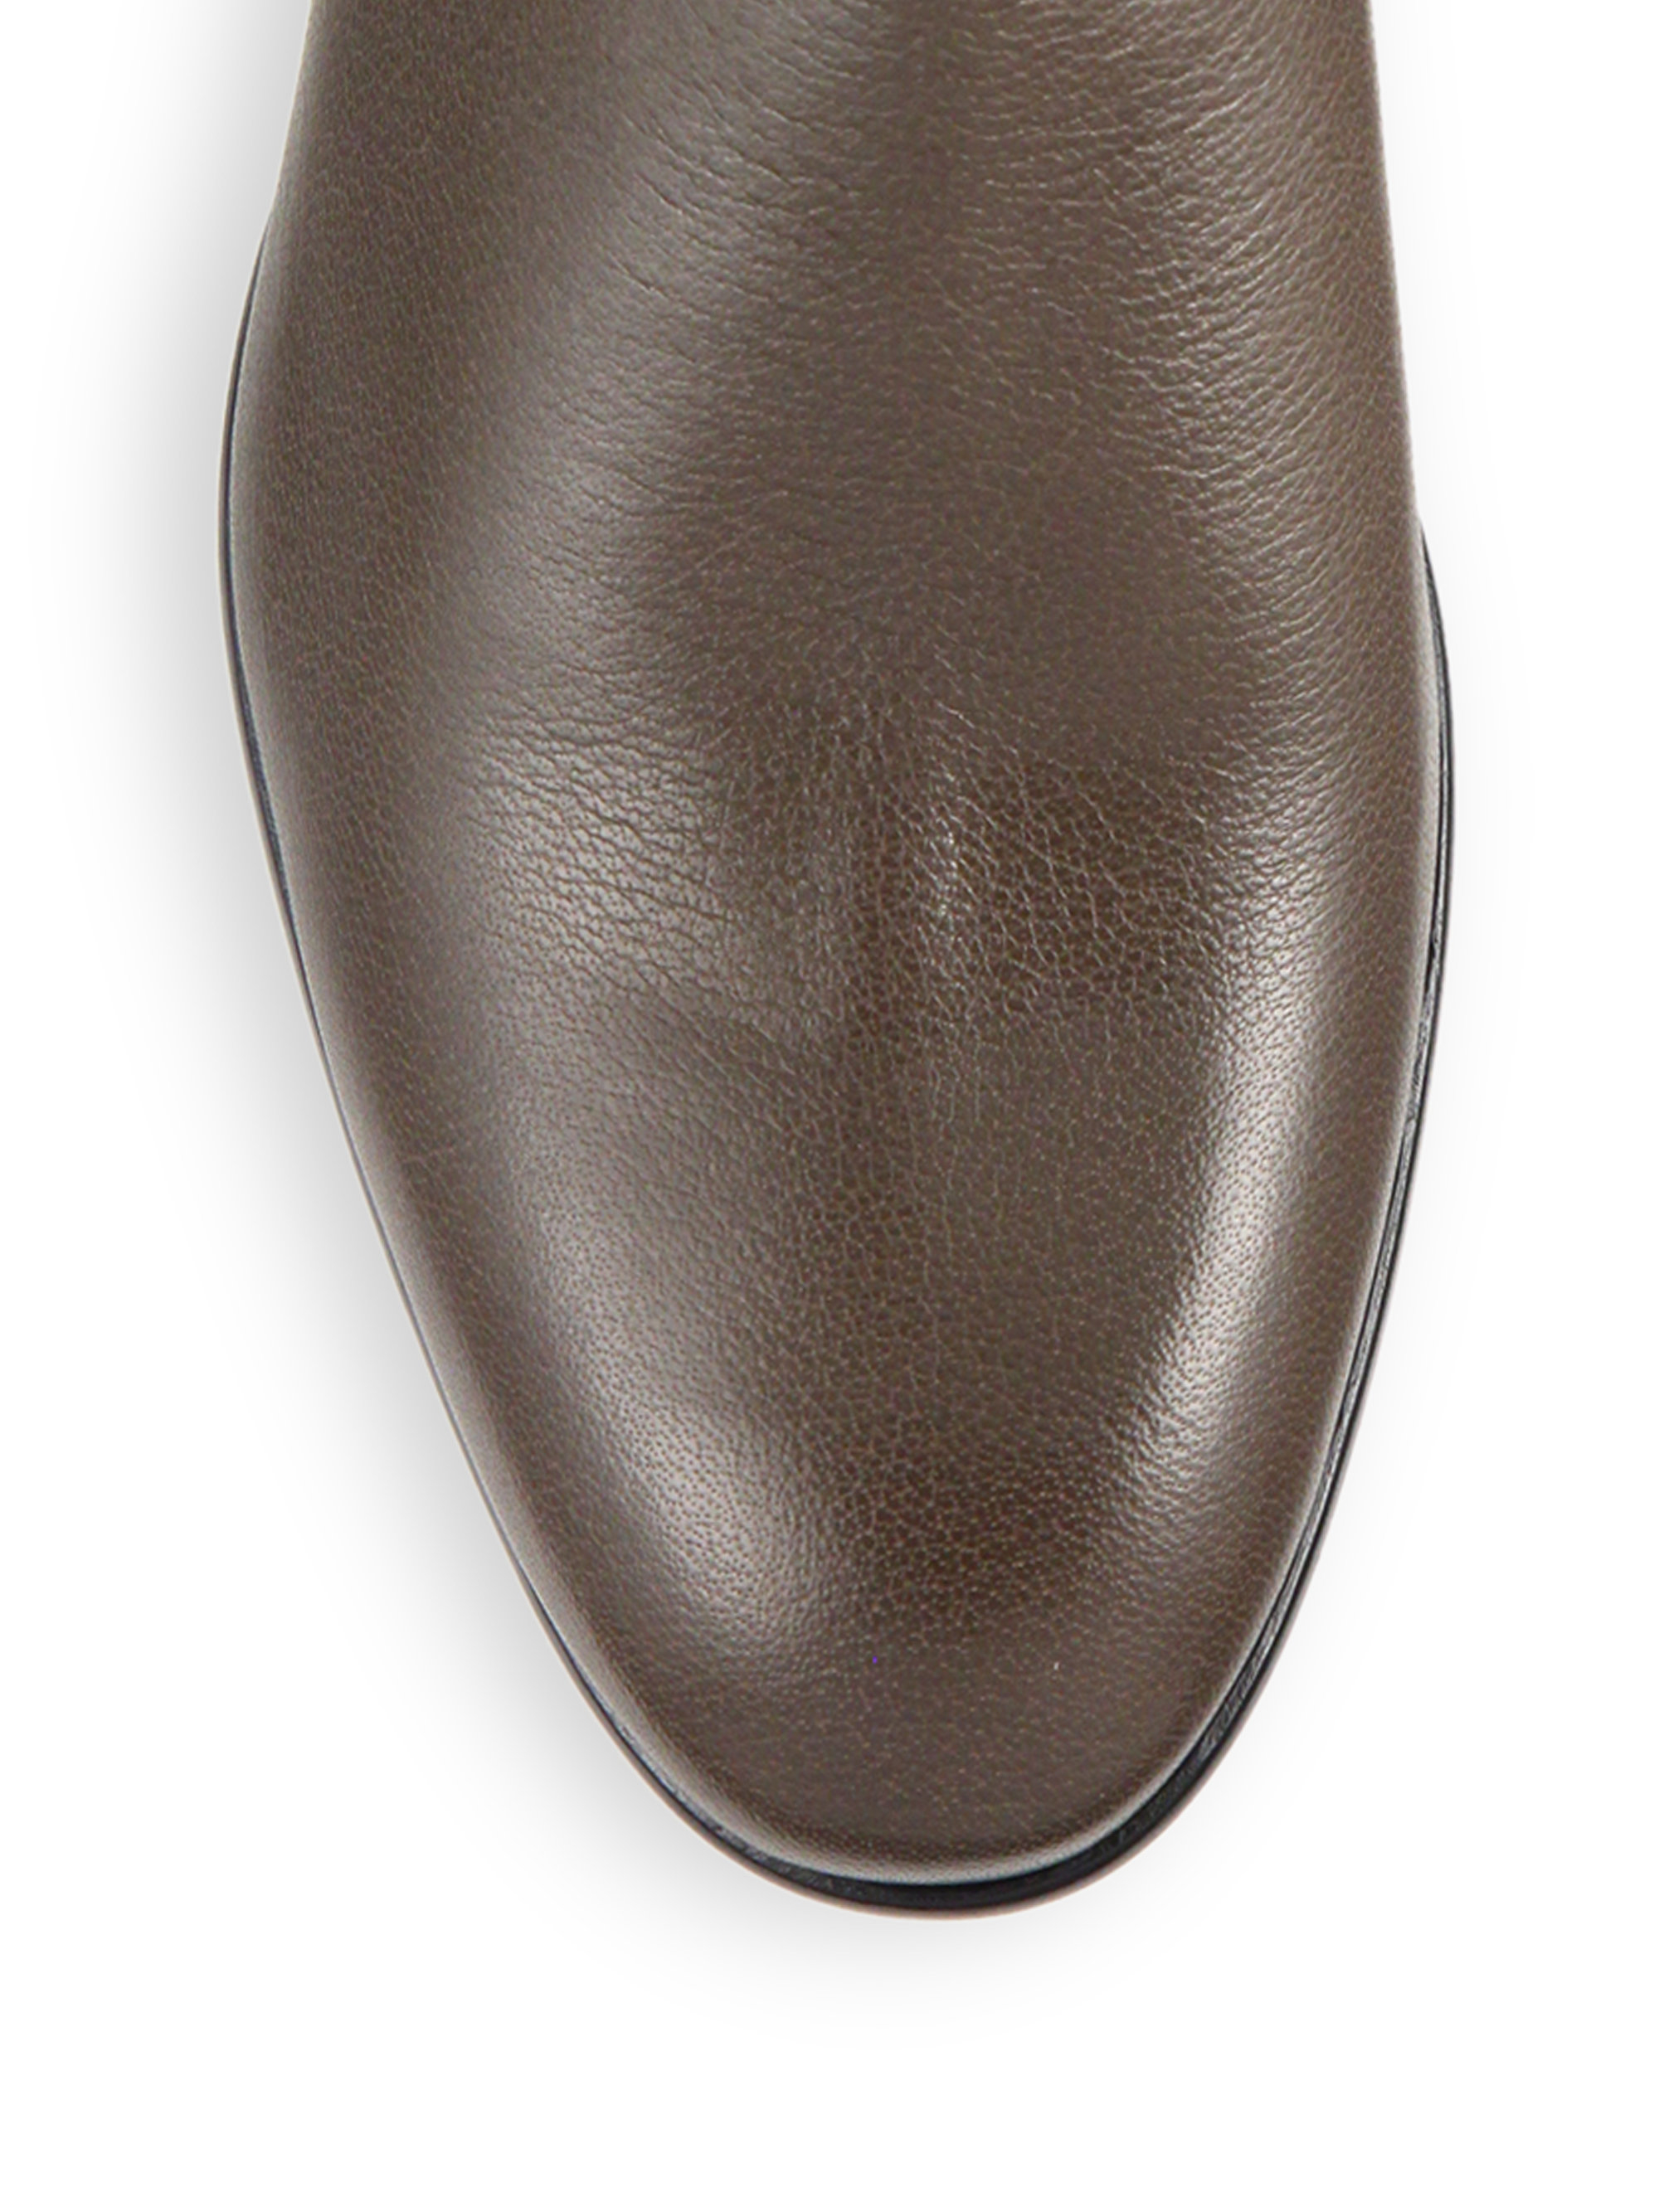 Maison Margiela Replica Water Buffalo Leather Ankle Boots